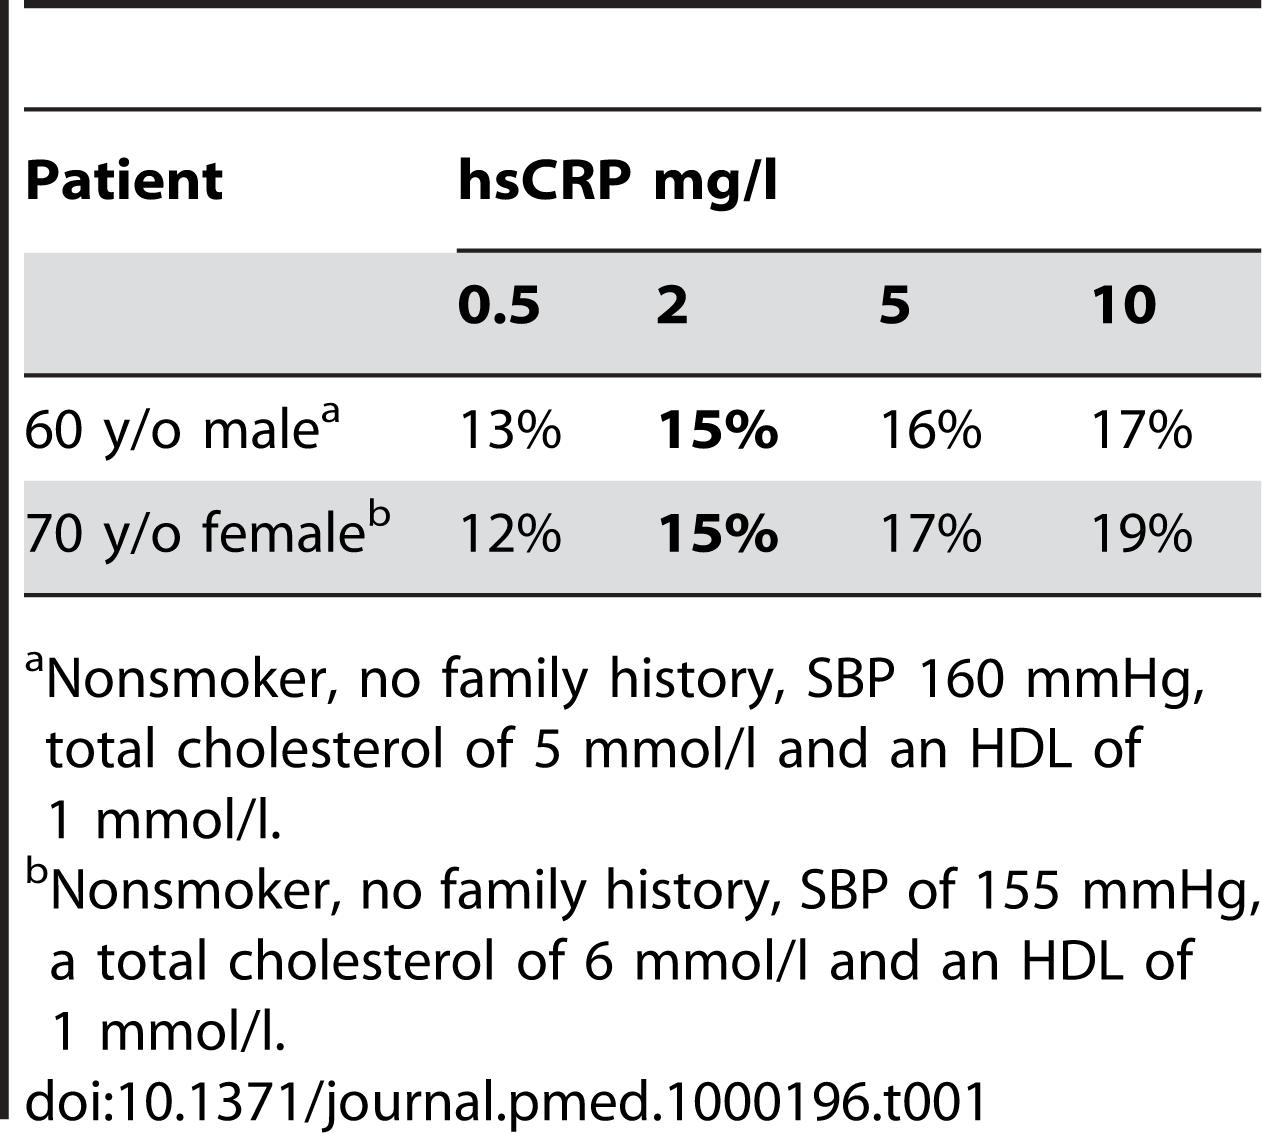 Estimated 10 year risk of a heart attack, stroke, or other major heart disease based on the risk calculator at reynoldsriskscore.com.